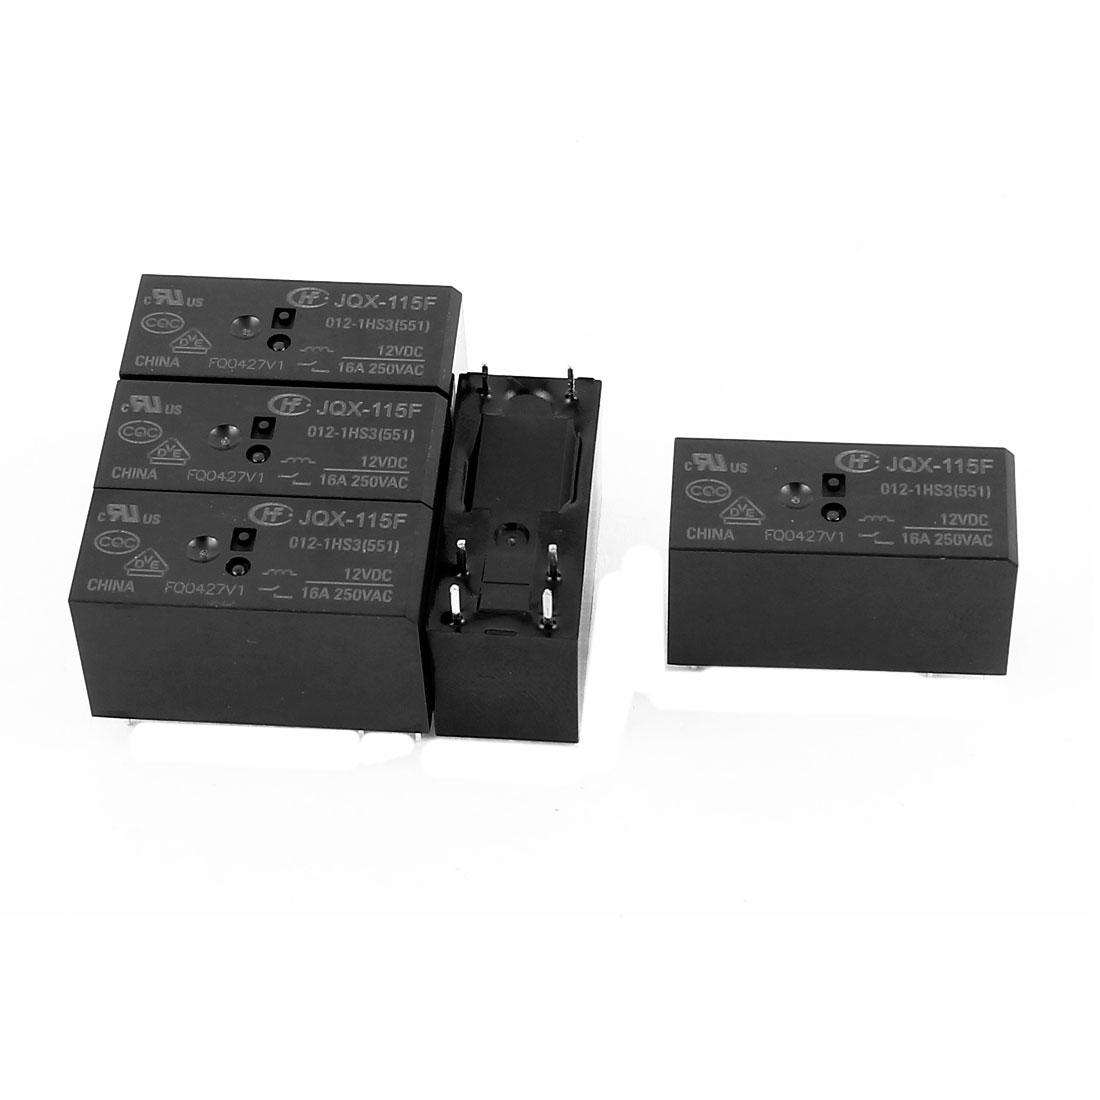 5 Pcs 12VDC 250VAC 16A 6 Terminal NO SPST JQX-115F-012-1HS3 Power Relay For PCB